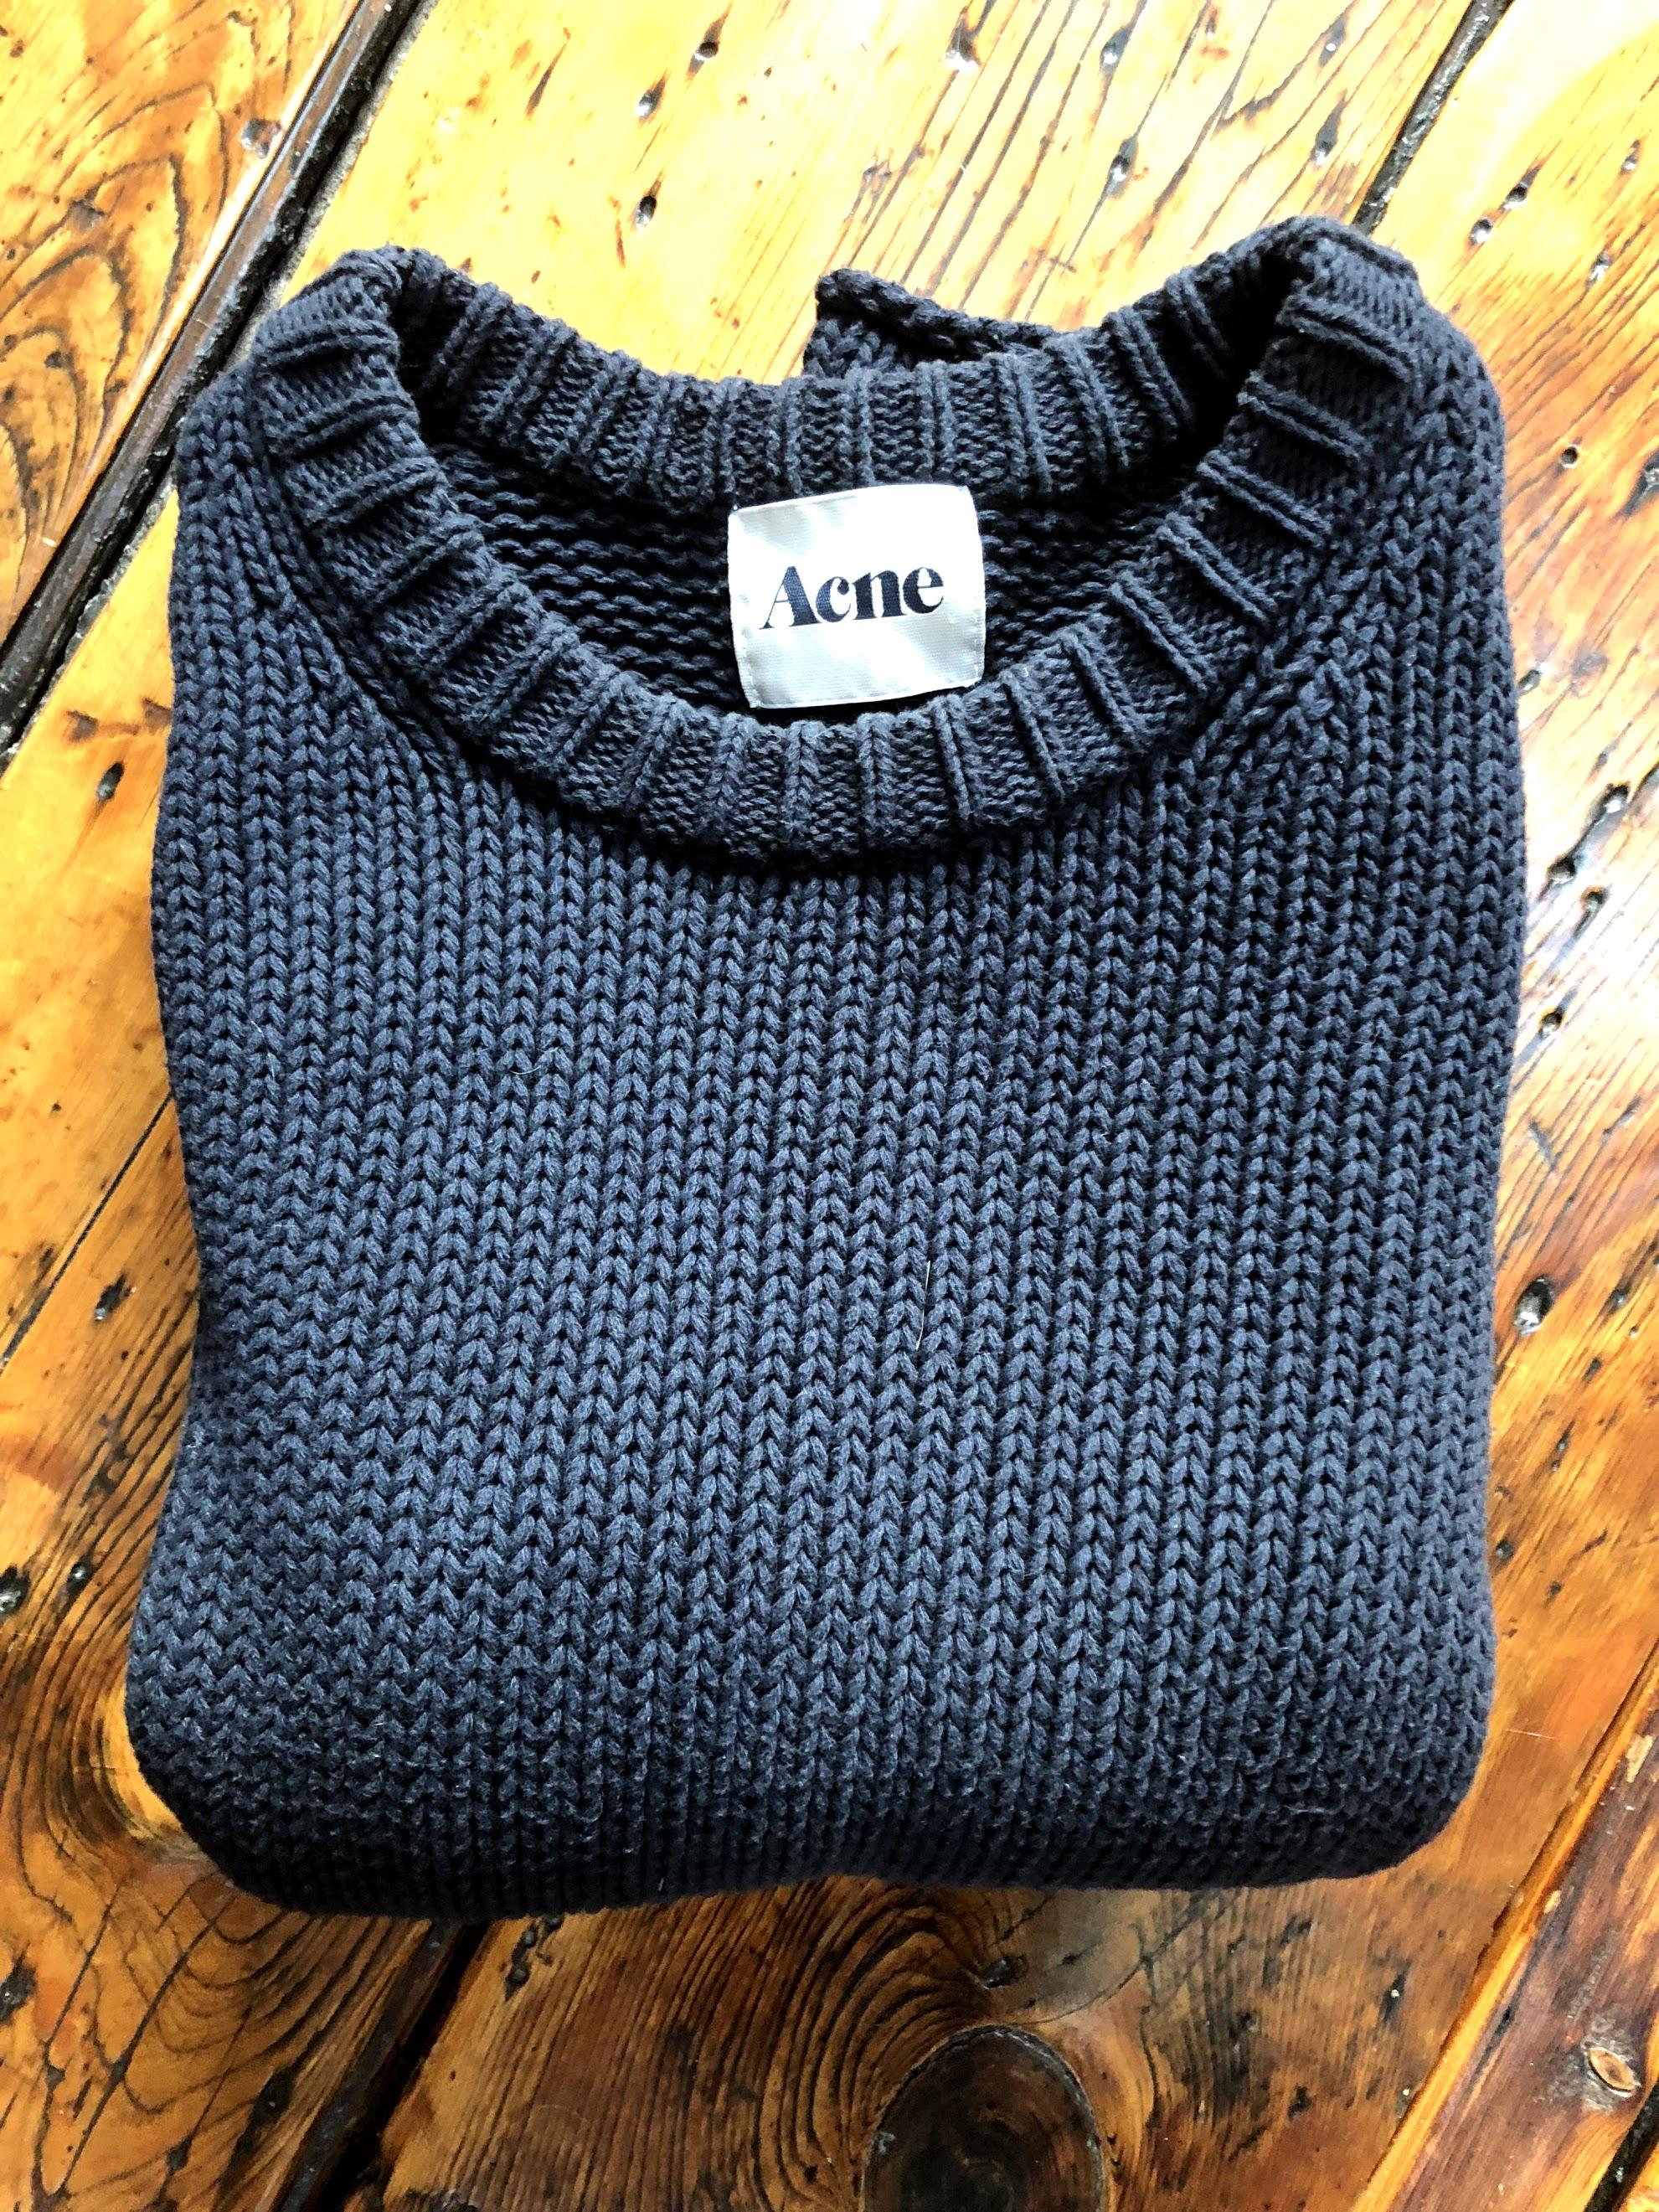 d18ede2fbb Acne Studios Helsinki Chunky Knit Navy Blue Sweater SS12 Size m ...